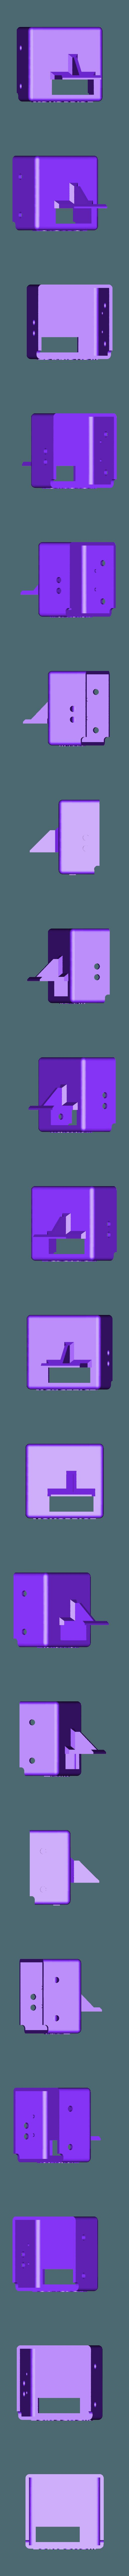 D6_BondTech_Ribbon_Holder_Cover_Monoprice_v2_v3.stl Download free STL file Wanhao D6 / Duplicator 6 / Monoprice Ultimate Maker Ribbon Cable Holder for BondTech • 3D print object, nik101968